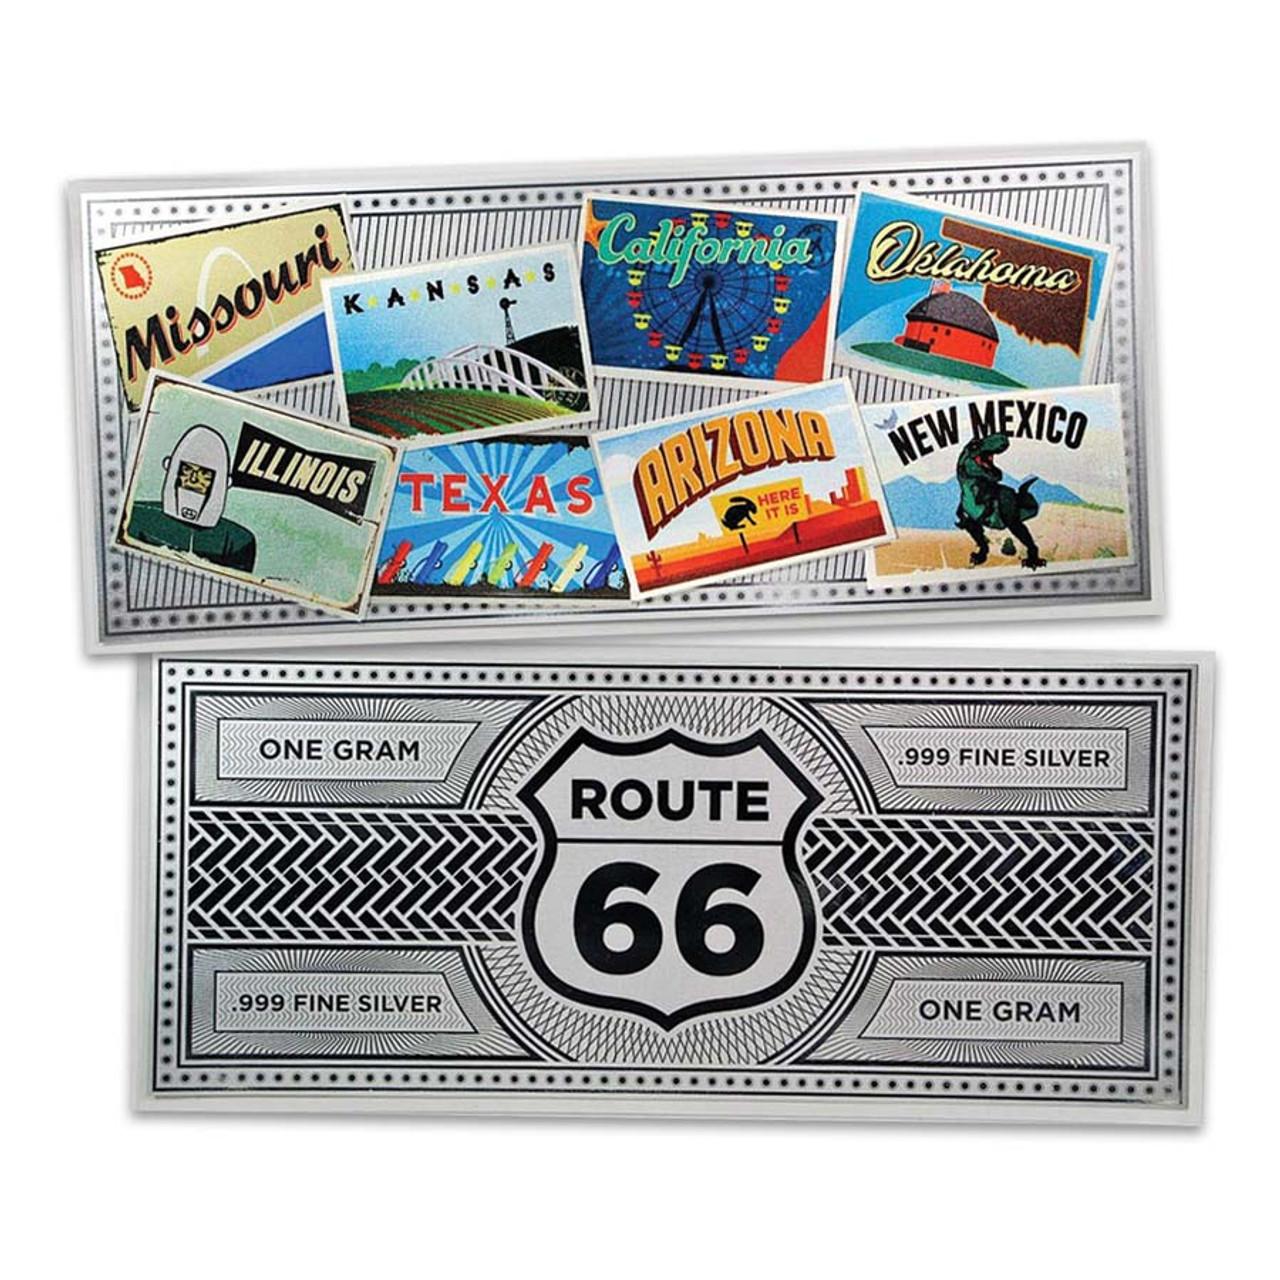 Route 66 Colorized 1 Gram Silver Foil Note